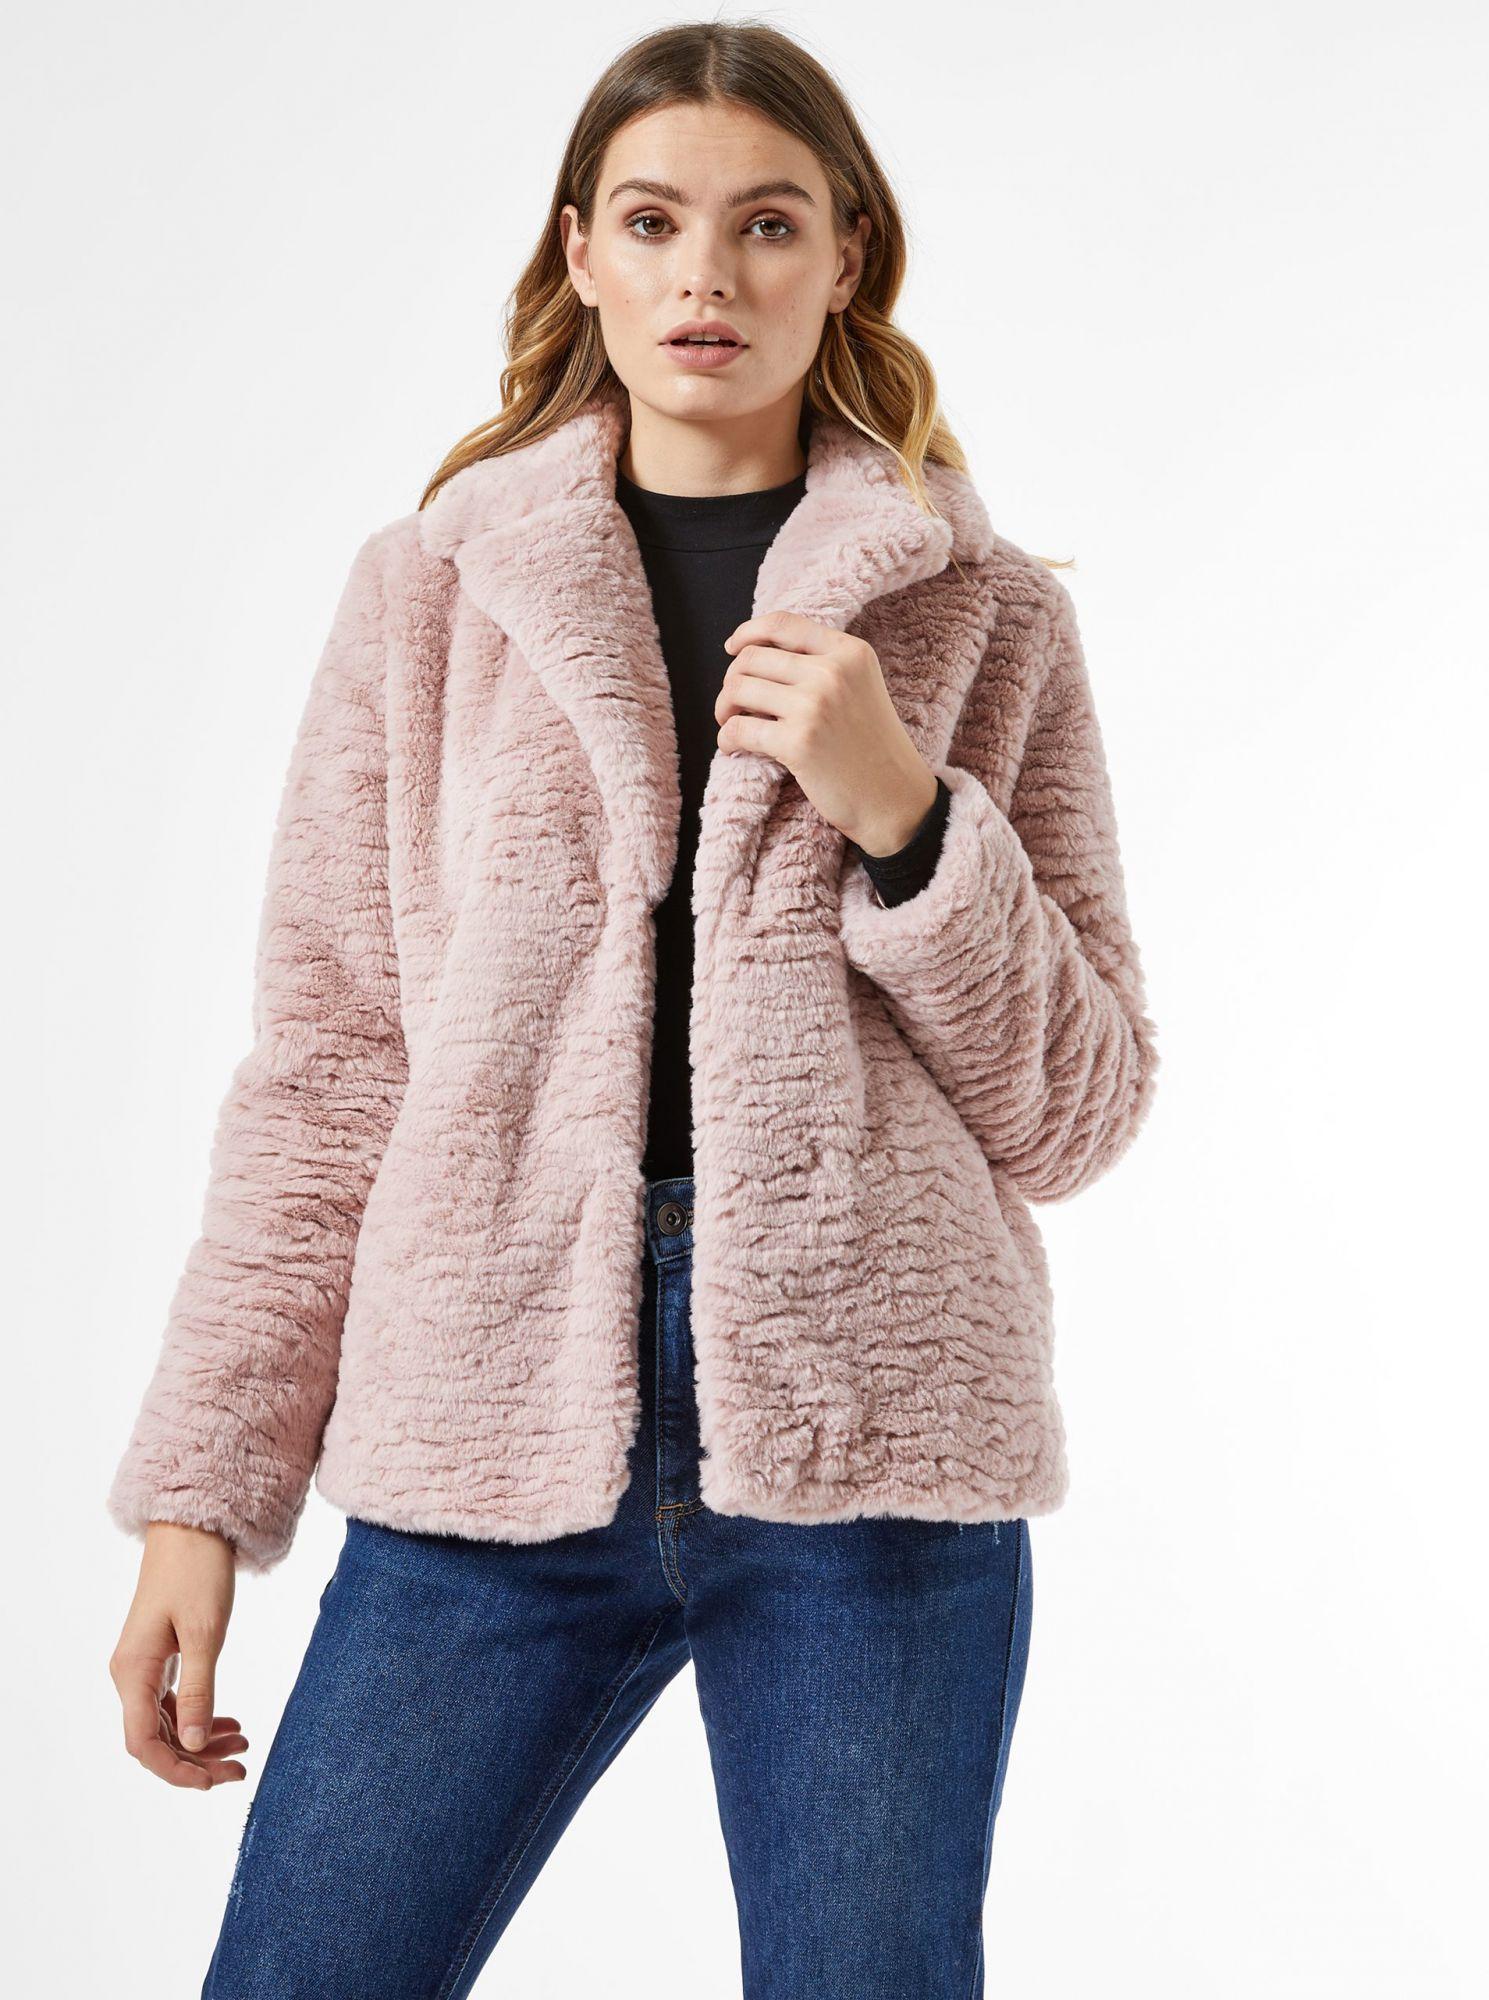 Růžový krátký kabát z umělého kožíšku Dorothy Perkins